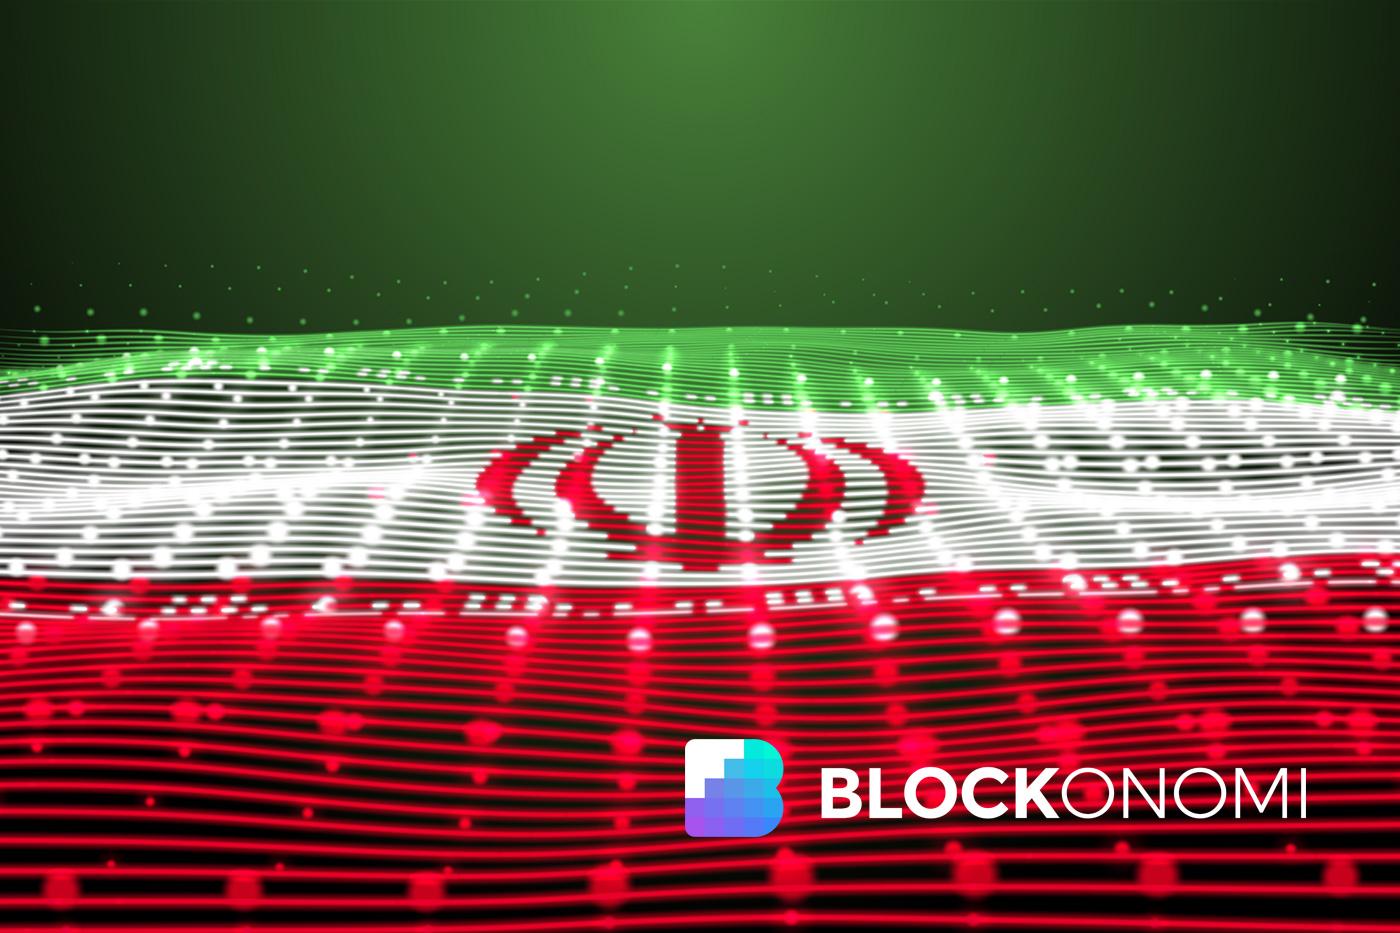 Pertukaran Crypto untuk Mendapatkan Lisensi berdasarkan Amandemen RUU Iran yang Diusulkan